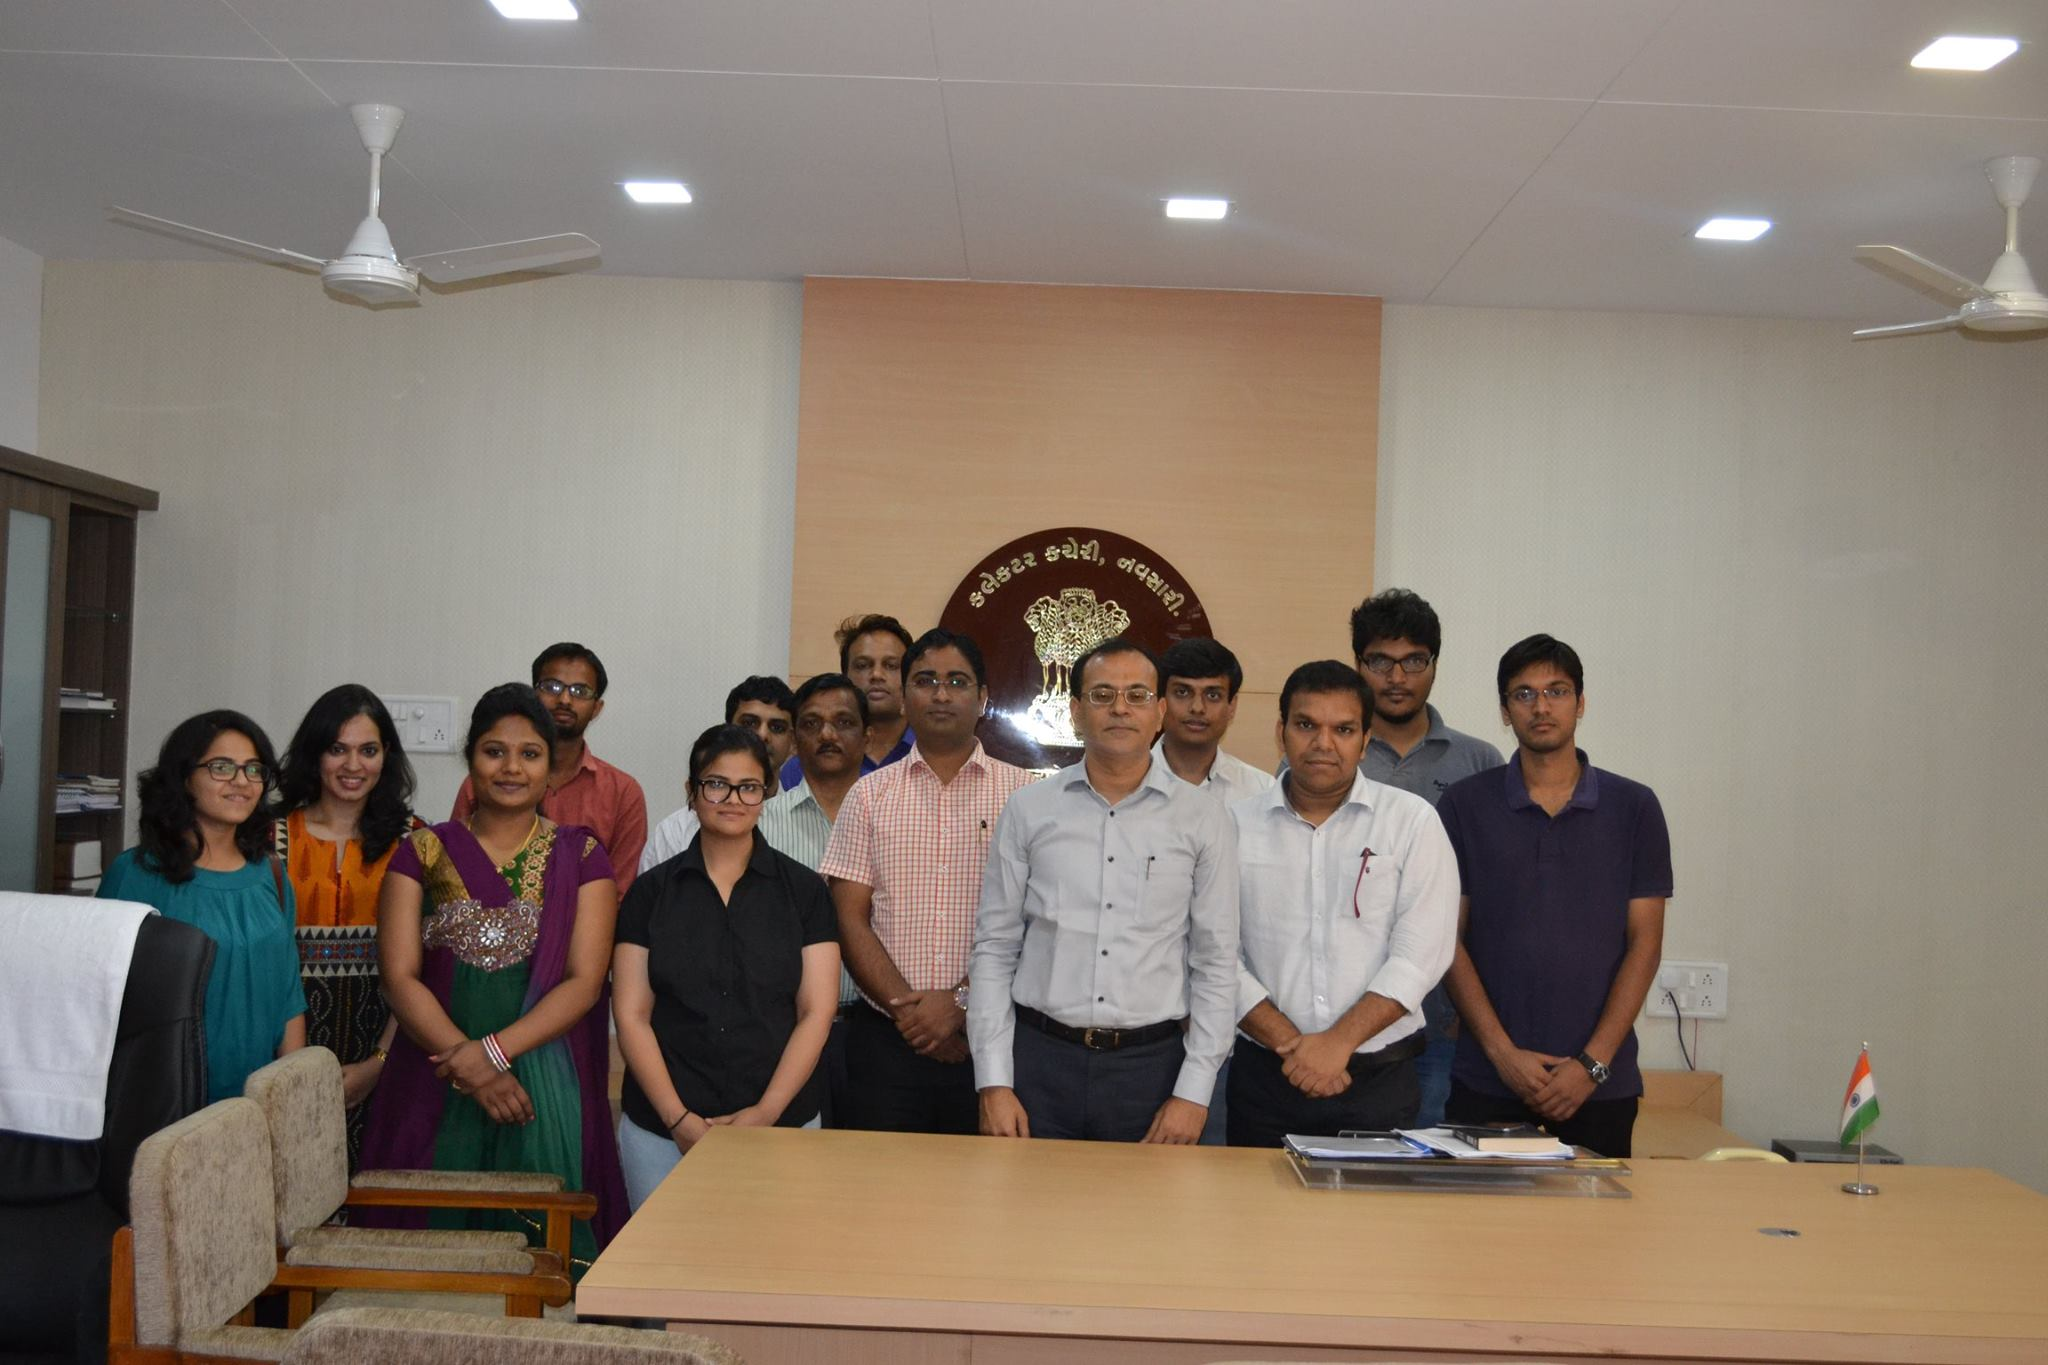 Group photo with the Shri Ravi Arora (Ce